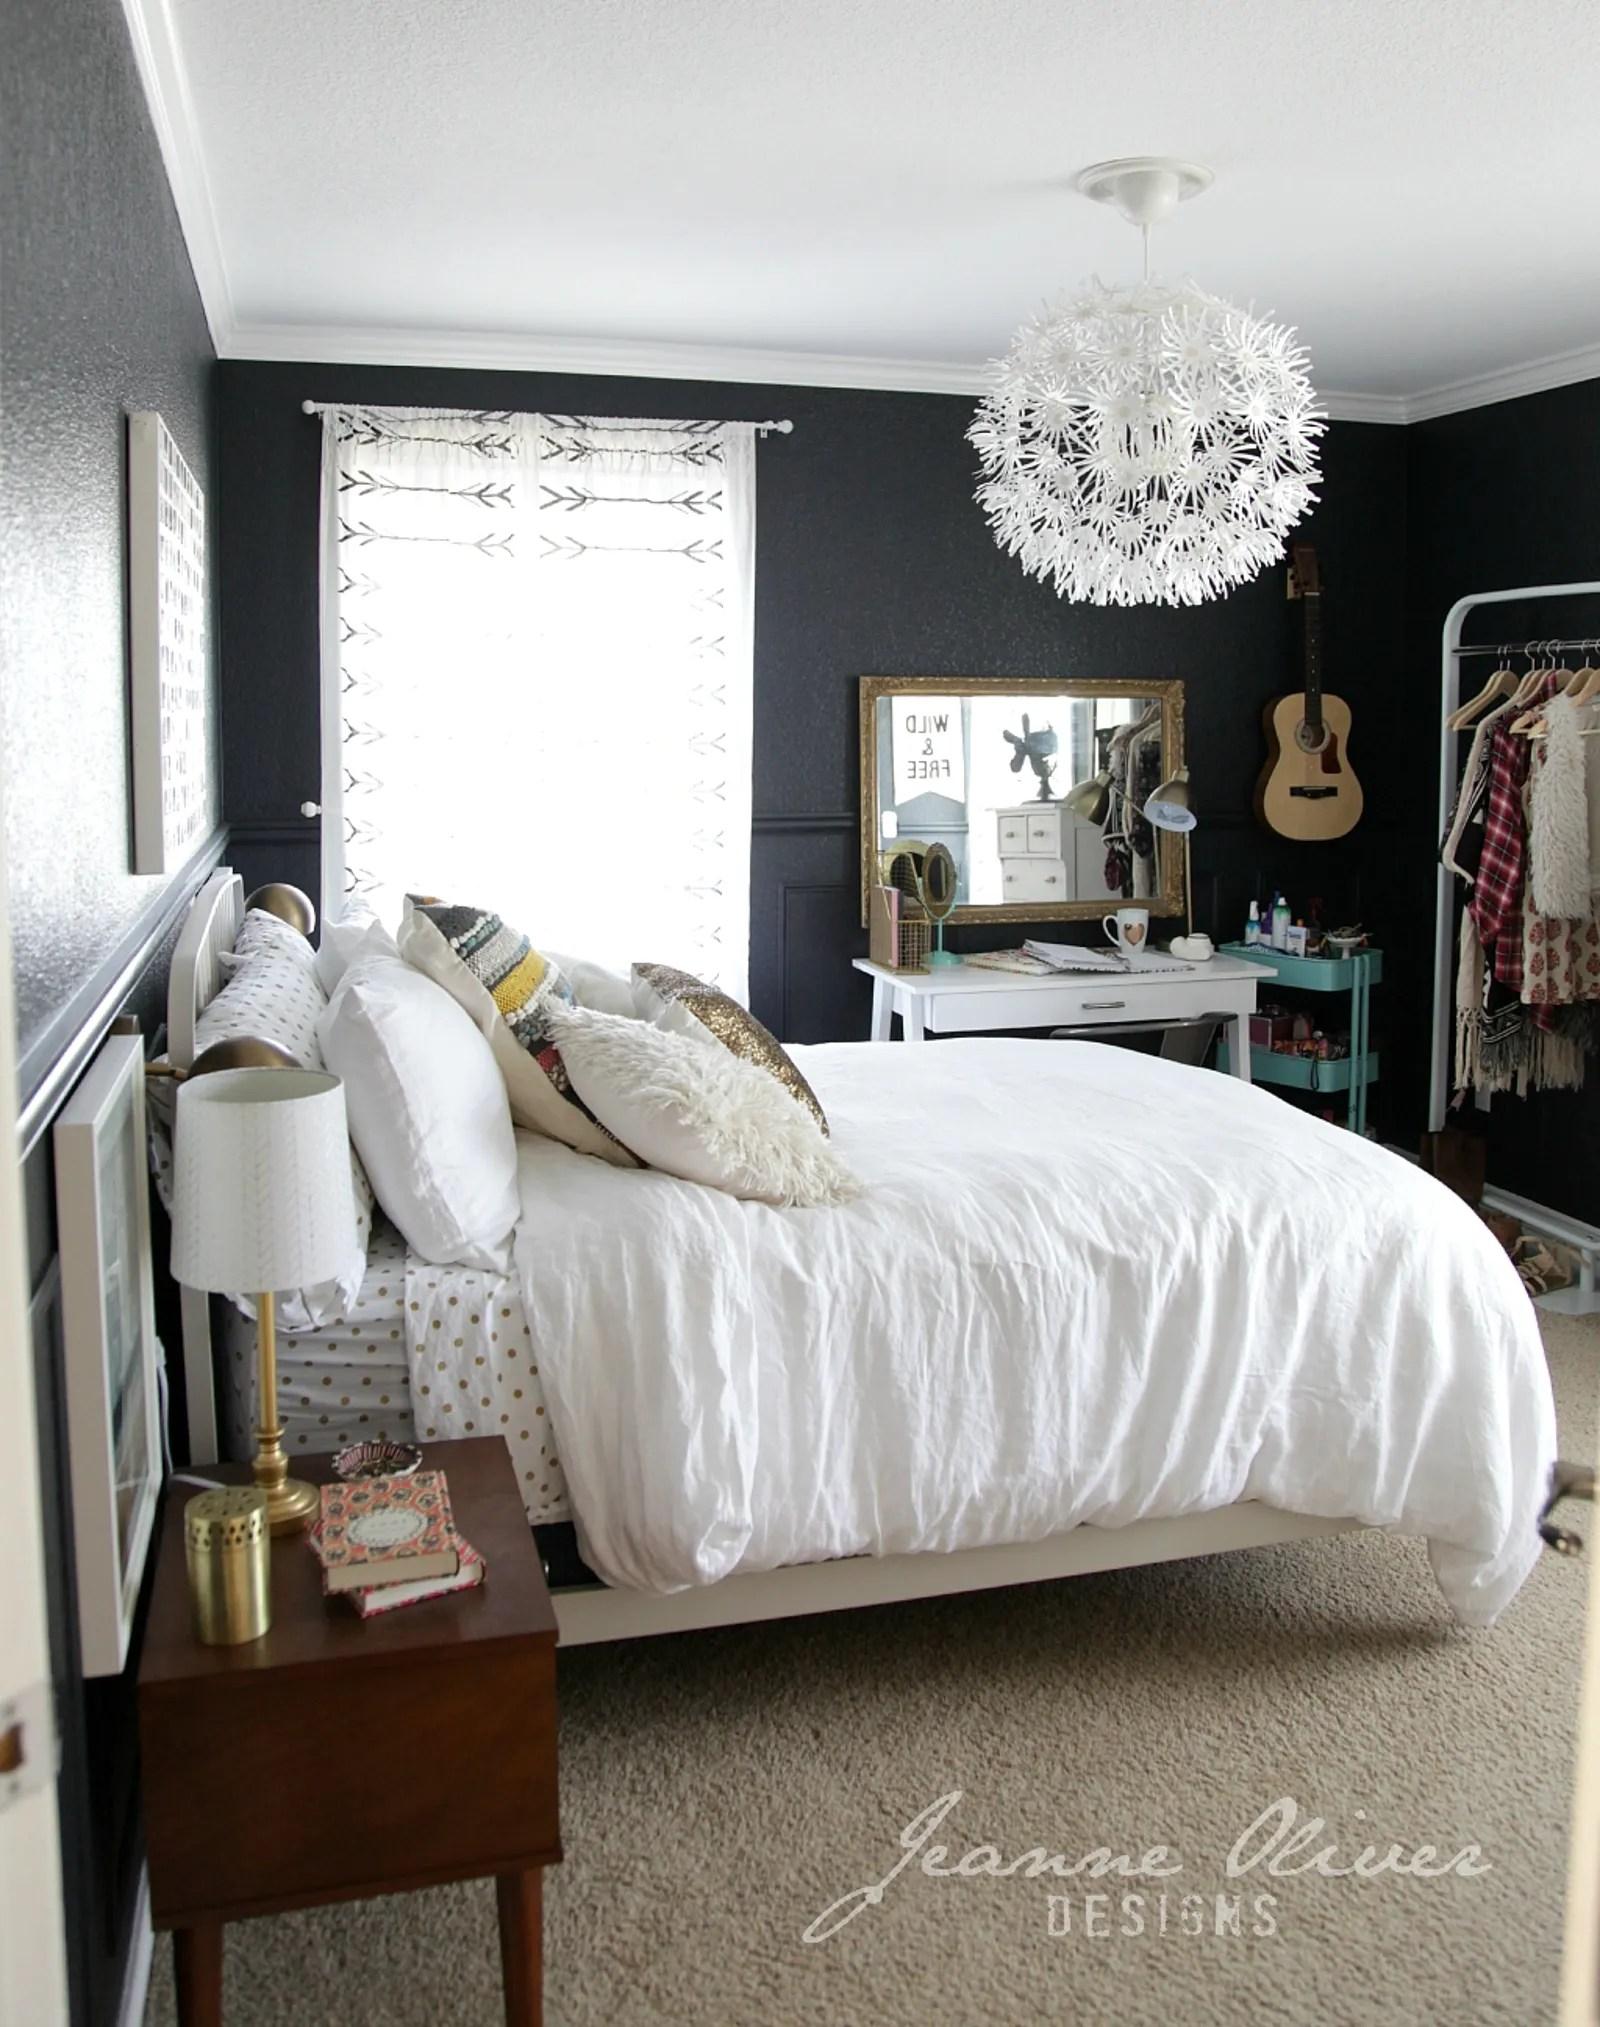 5 Stylish Teen Bedrooms - Teen Vogue on Teenager Simple Small Bedroom Design  id=23576